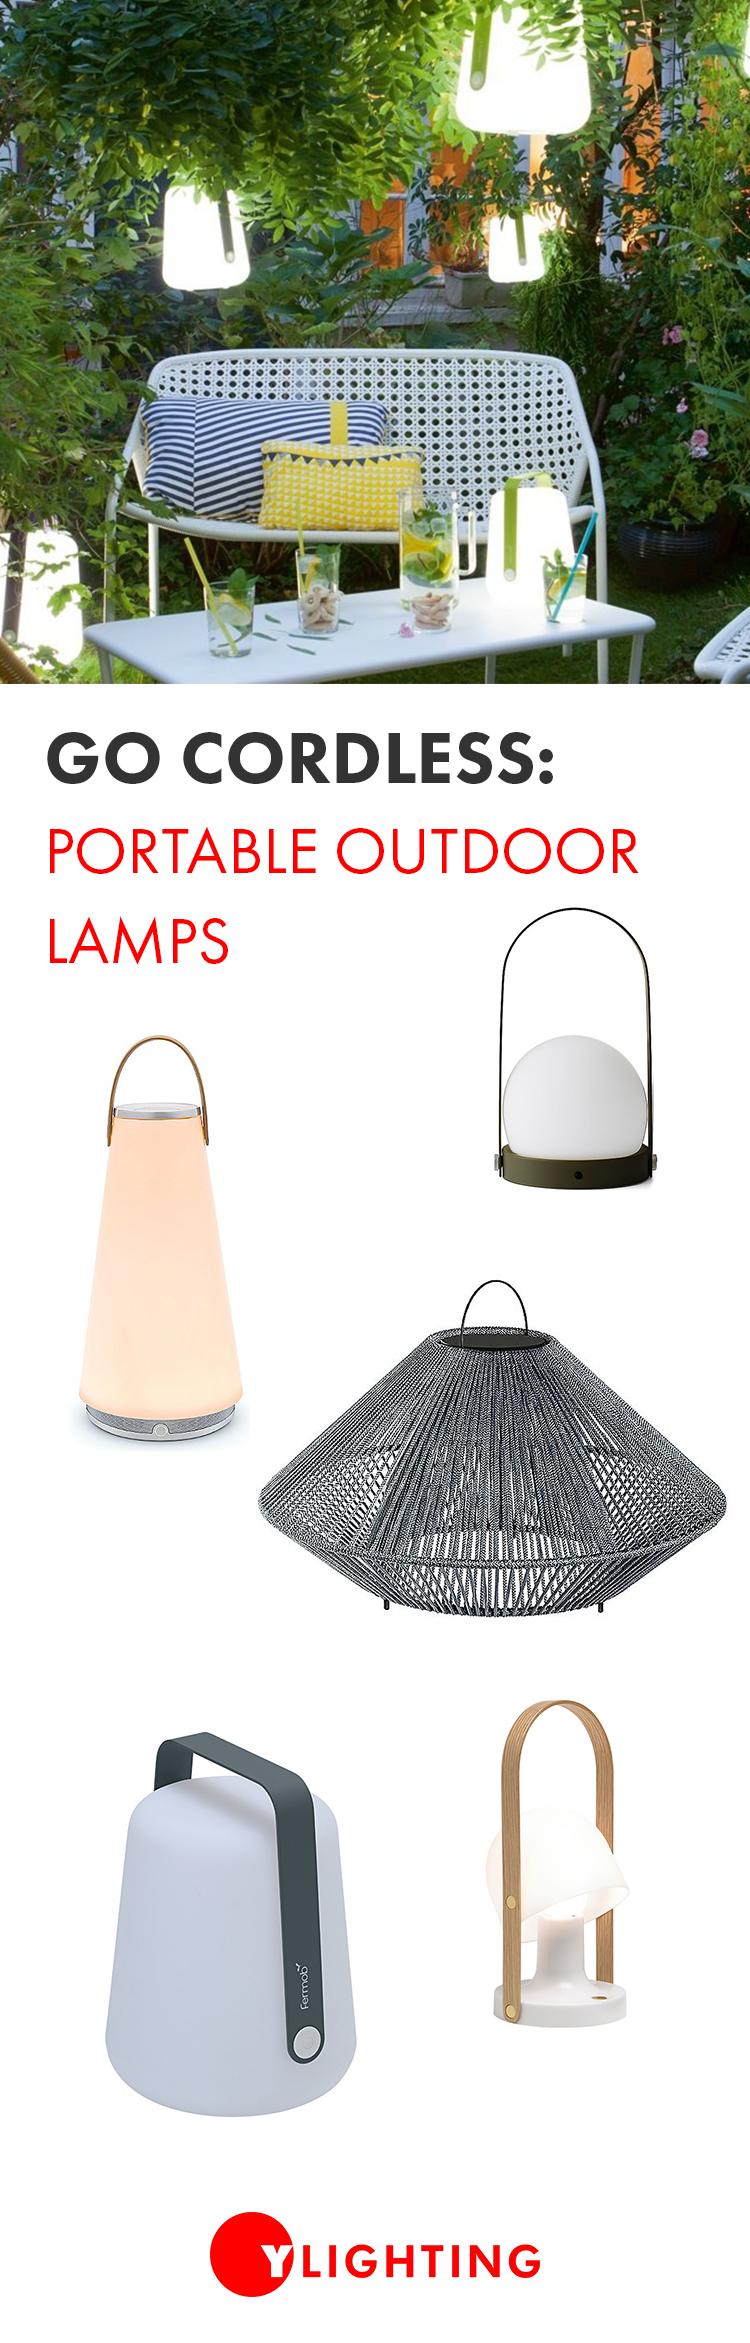 Go Cordless Portable Outdoor Lamps Ylighting Ideas Contemporary Outdoor Lighting Modern Outdoor Lighting Modern Outdoor Lighting Fixtures